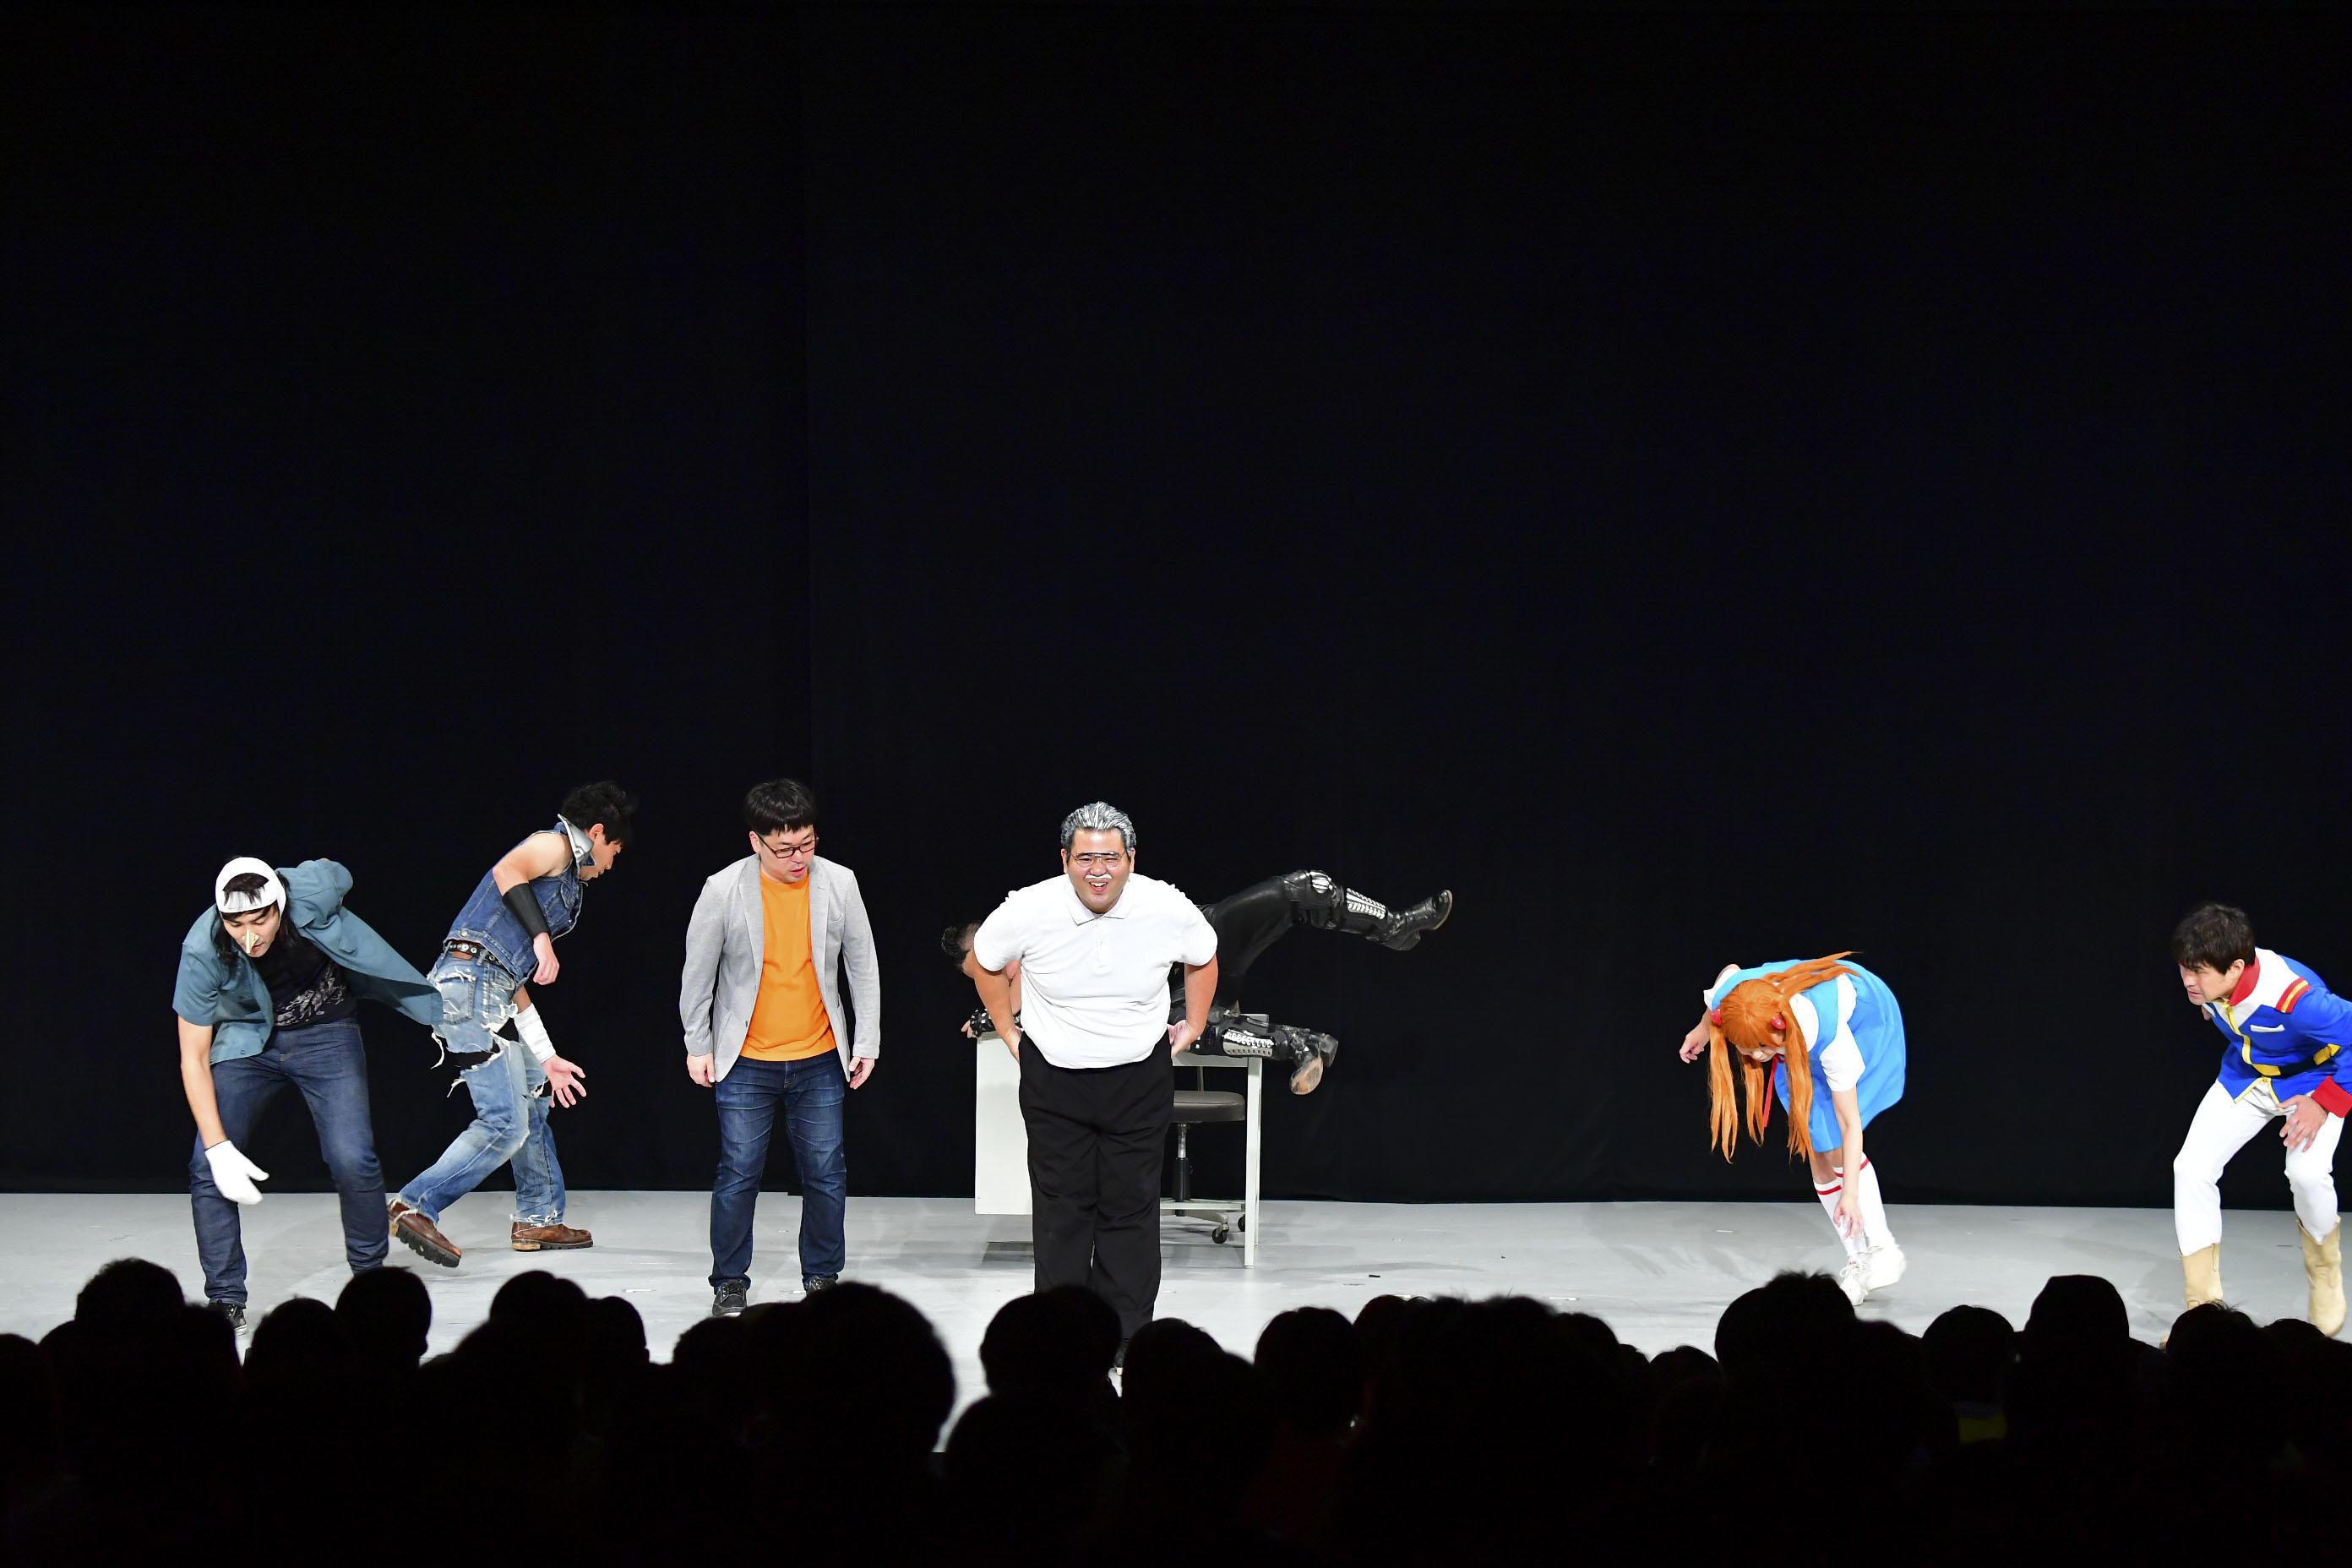 http://news.yoshimoto.co.jp/20171029150731-9a7659b91851ab3d94f14ad2f47875cd6a4e2a5f.jpg